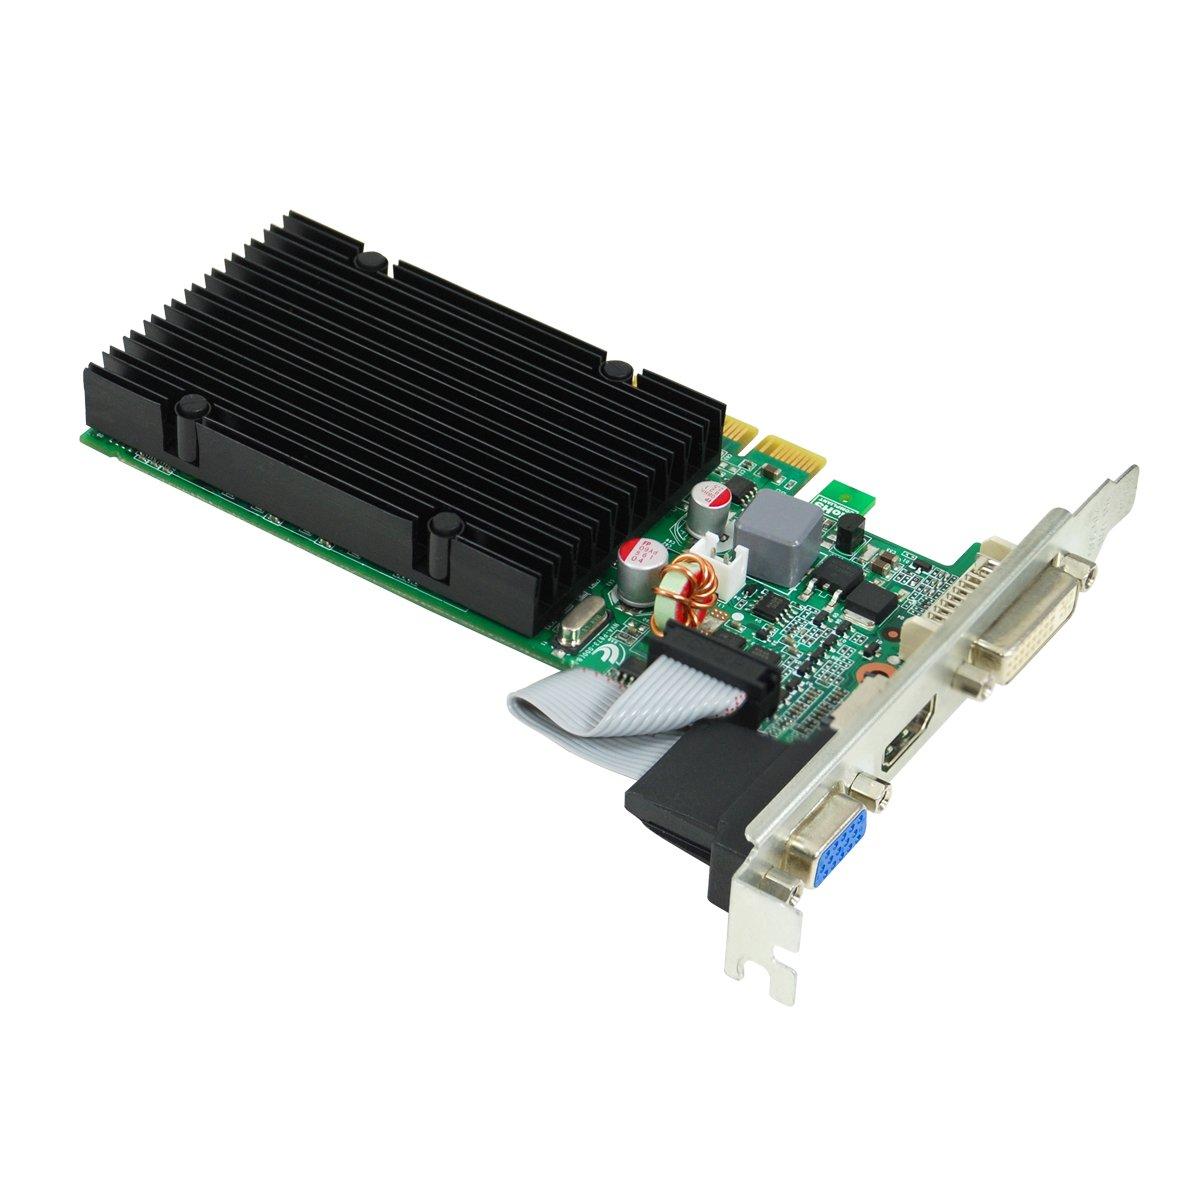 Amazon.com: EVGA GeForce 8400 GS Passive 512 MB DDR3 PCI Express 2.0  DVI/HDMI/VGA Graphics Card, 512-P3-1301-KR: Electronics